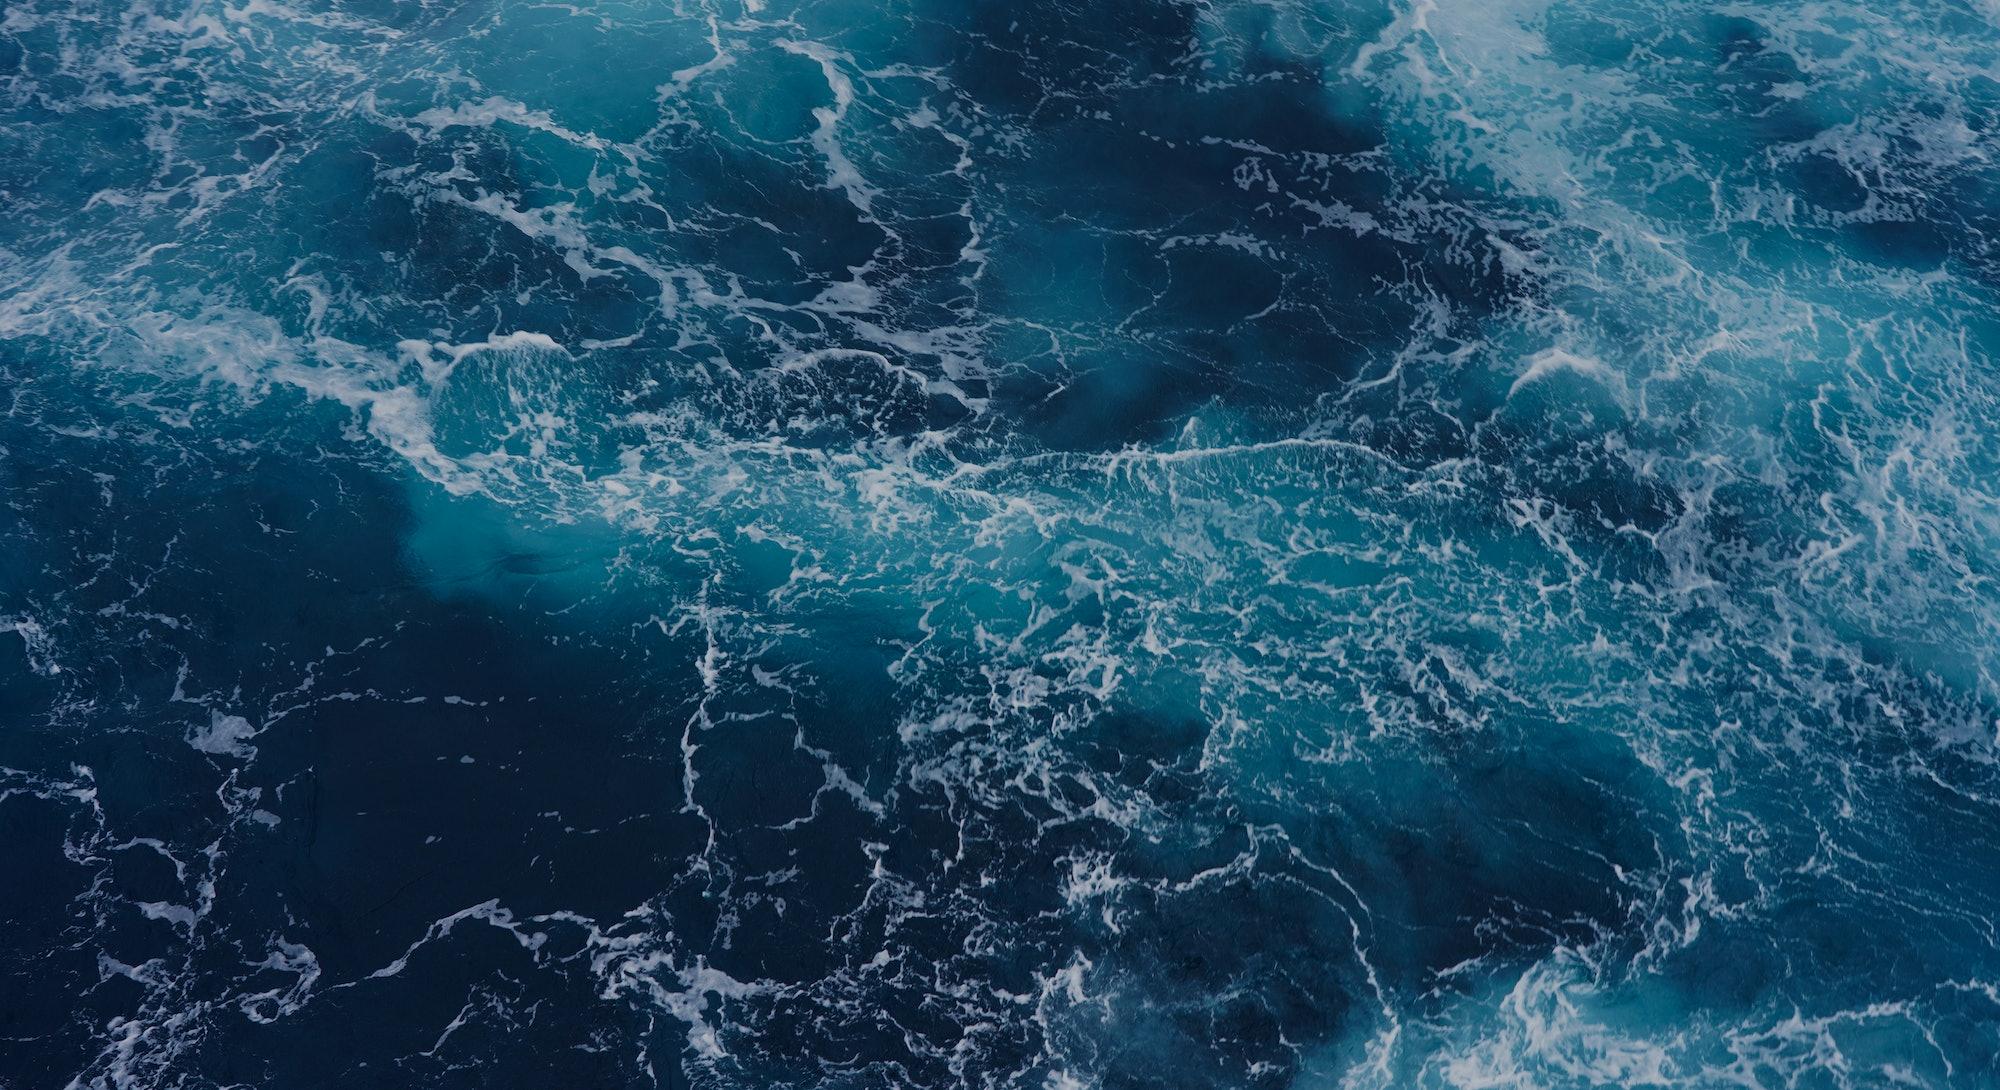 Abstraction of sea foam in the ocean. Dark water, storm waves